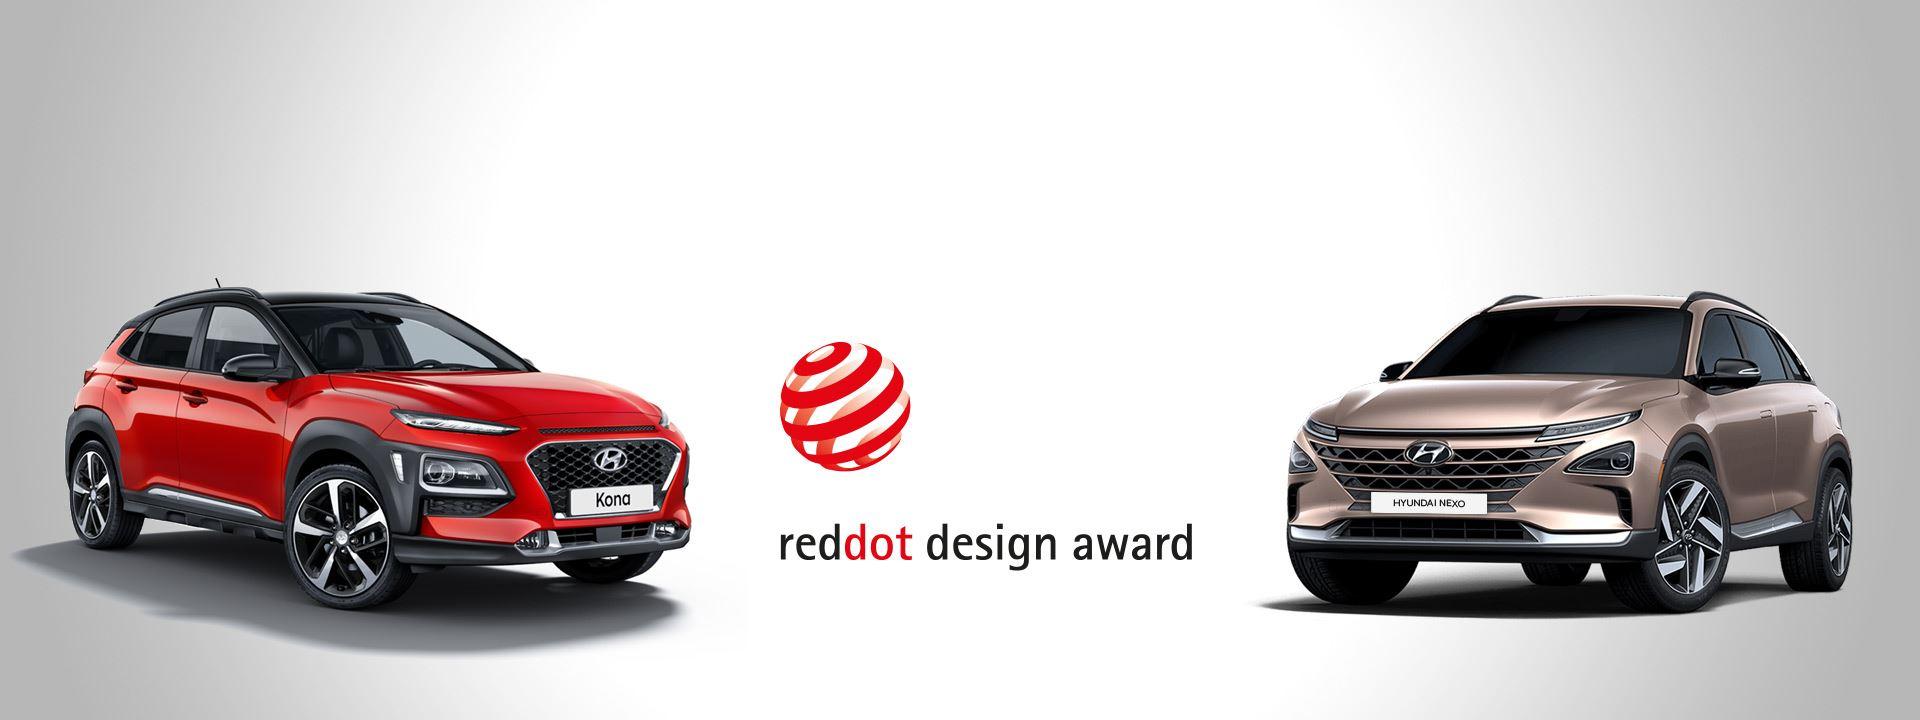 red dot design award 2018 voor hyundai kona en nexo. Black Bedroom Furniture Sets. Home Design Ideas